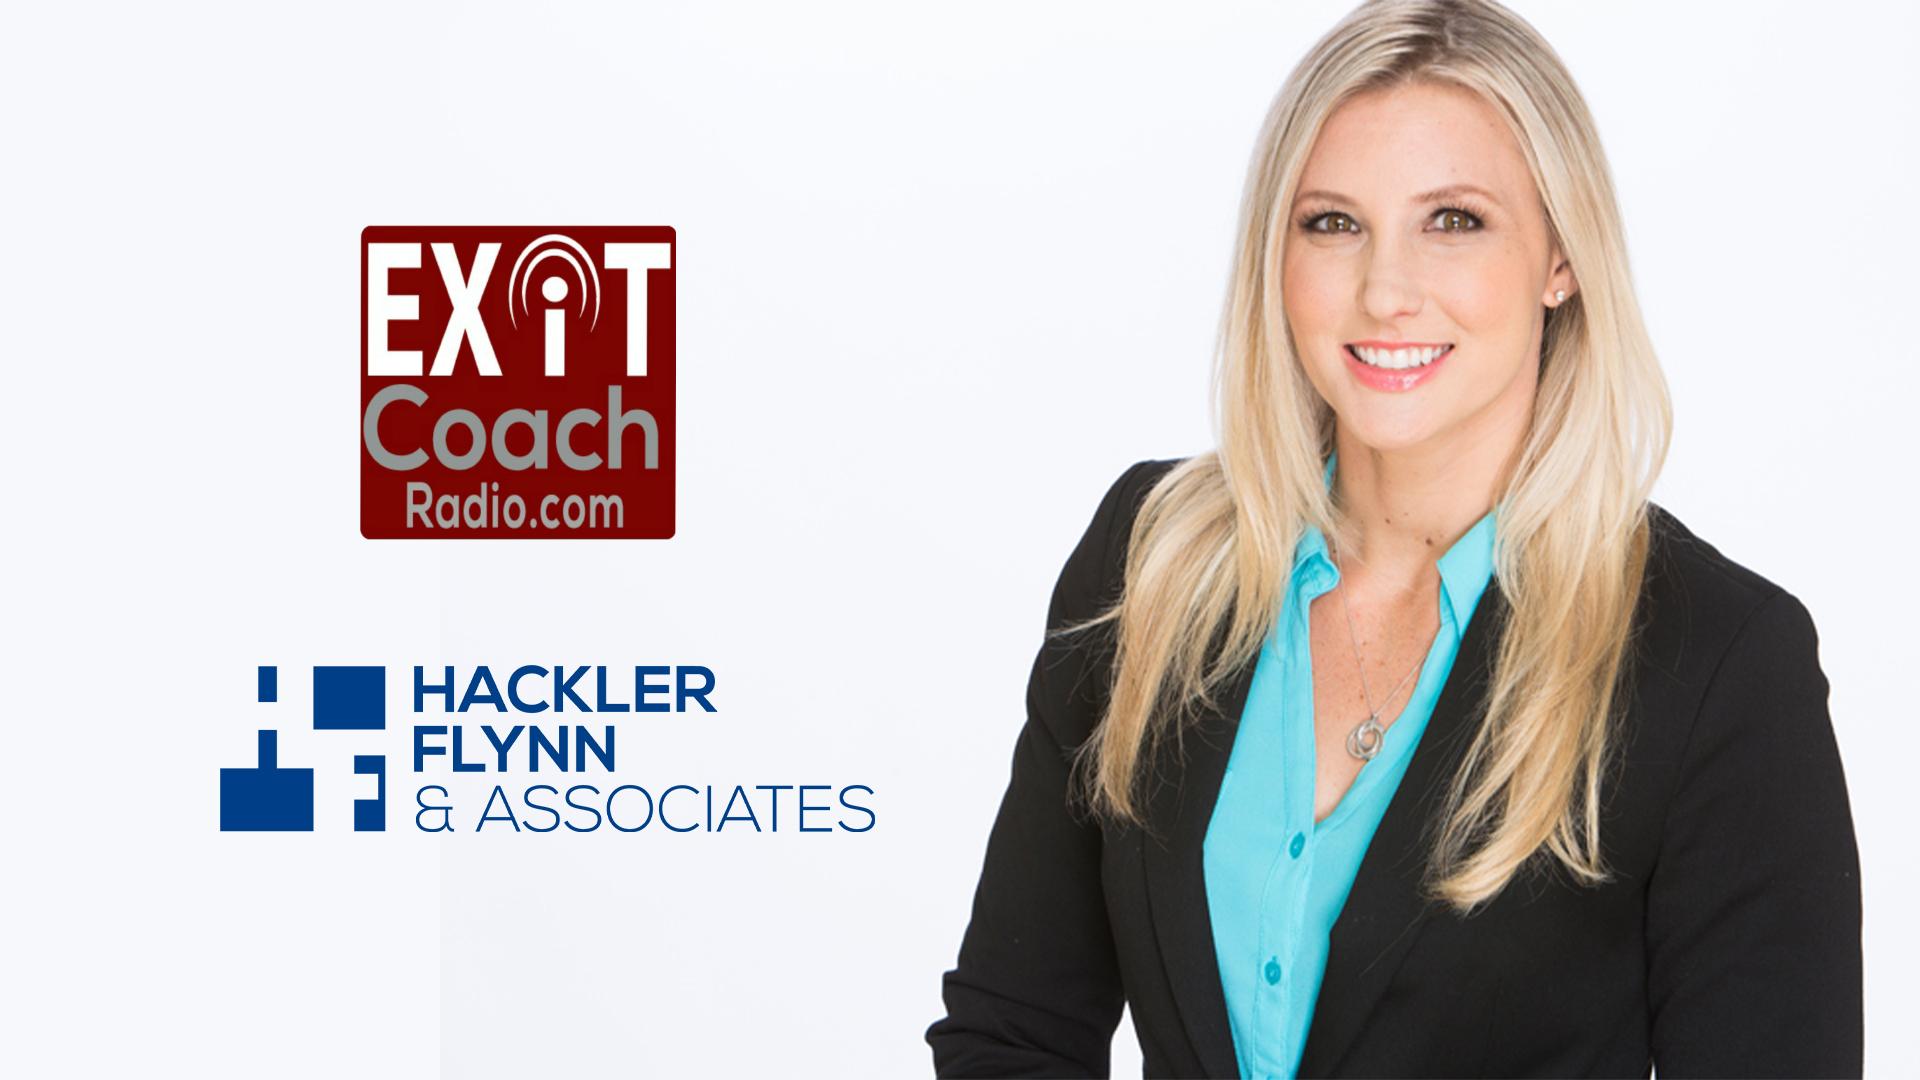 Exit Coach Radio Show Hackler Flynn